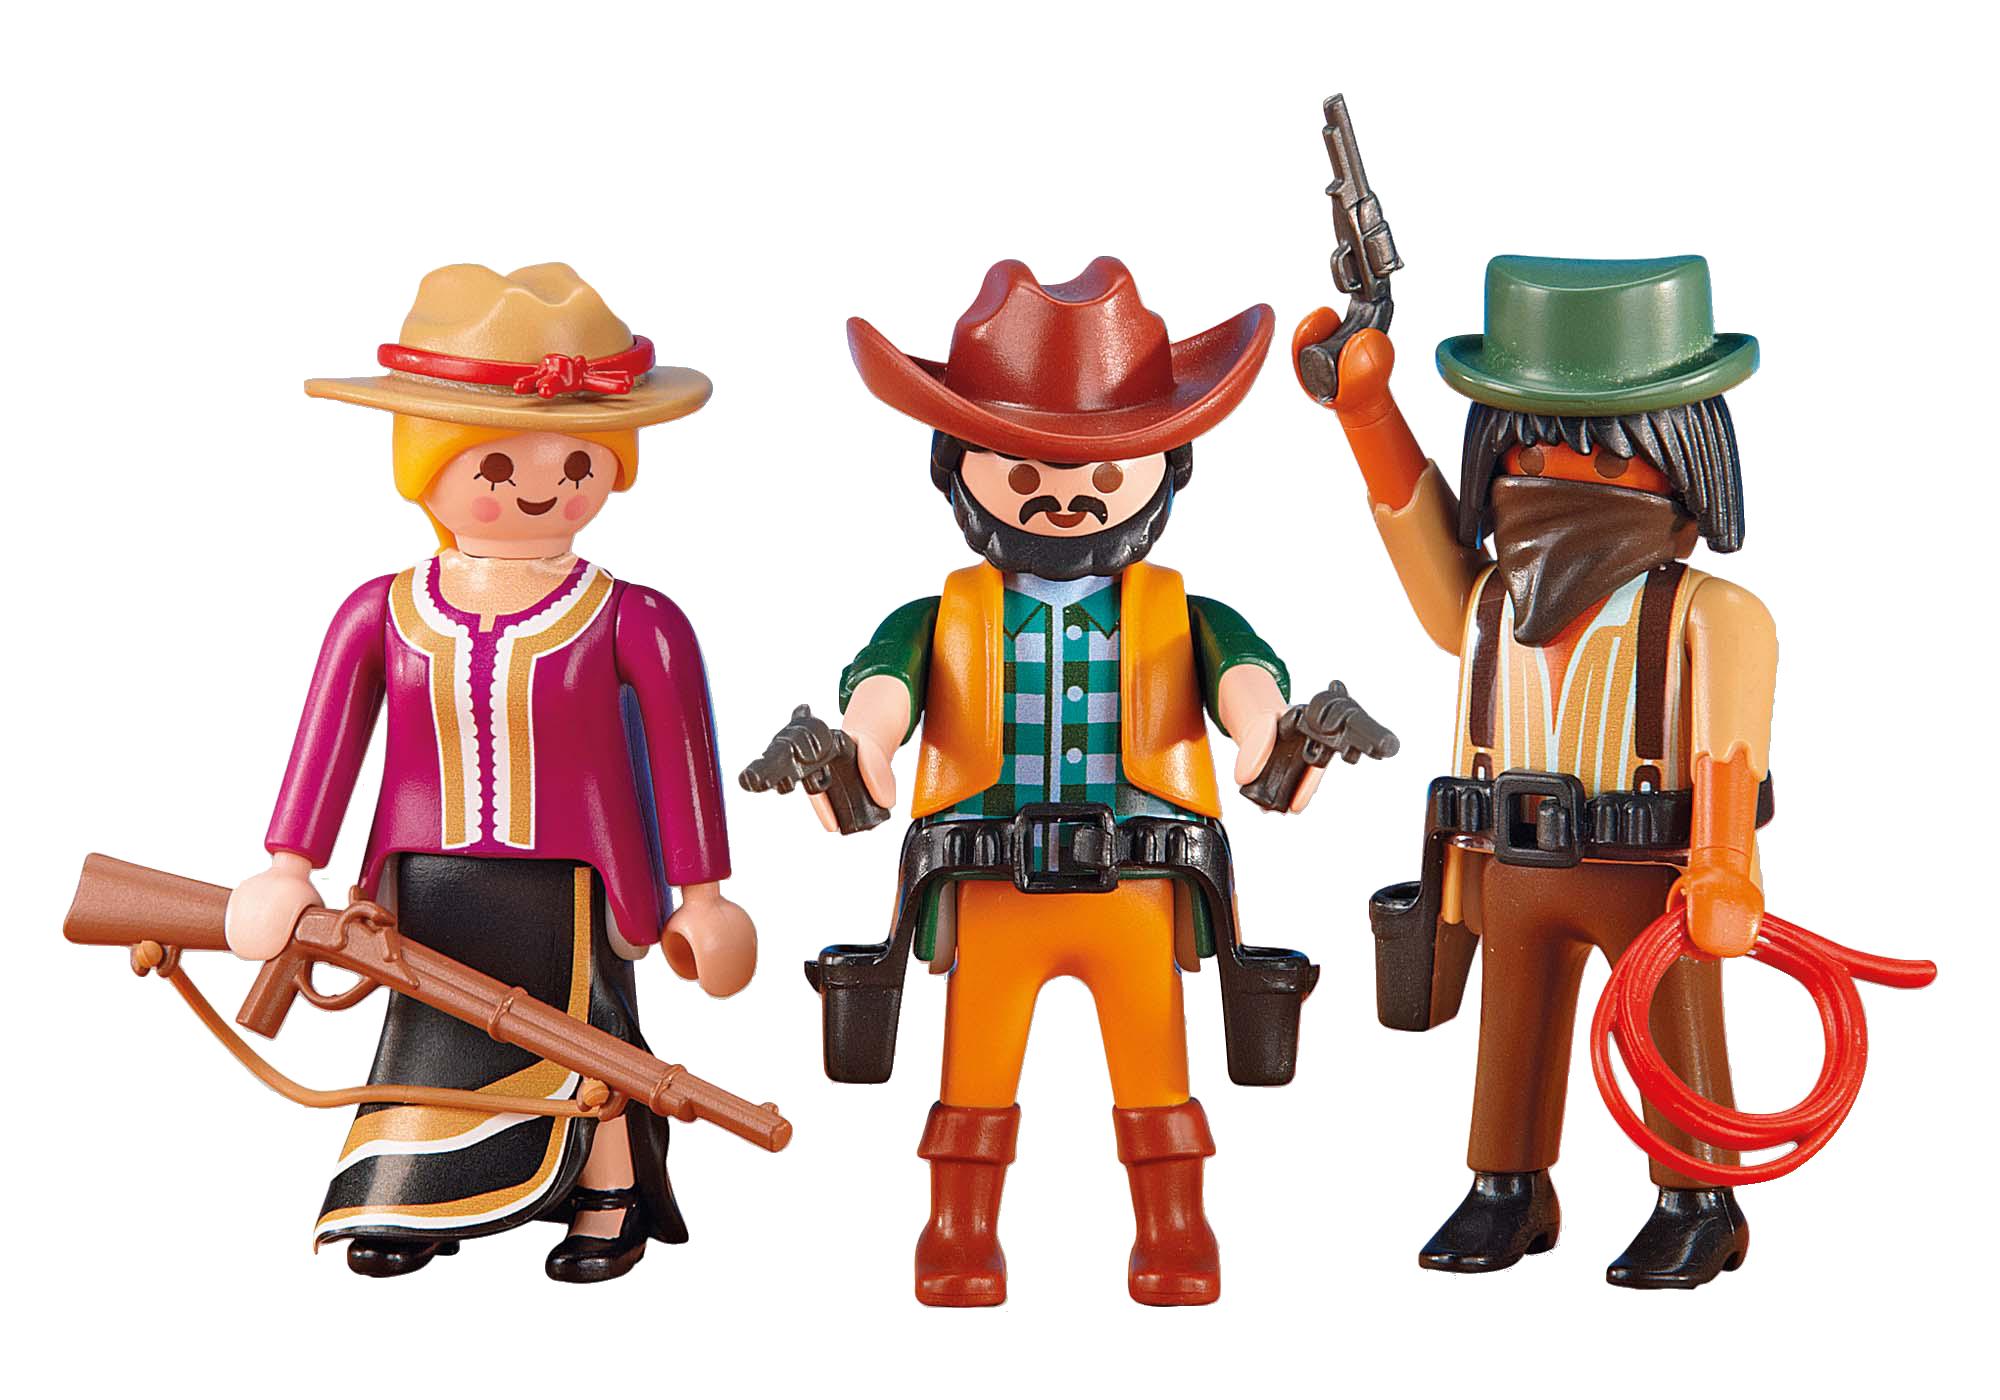 http://media.playmobil.com/i/playmobil/6278_product_detail/3 cow-boys